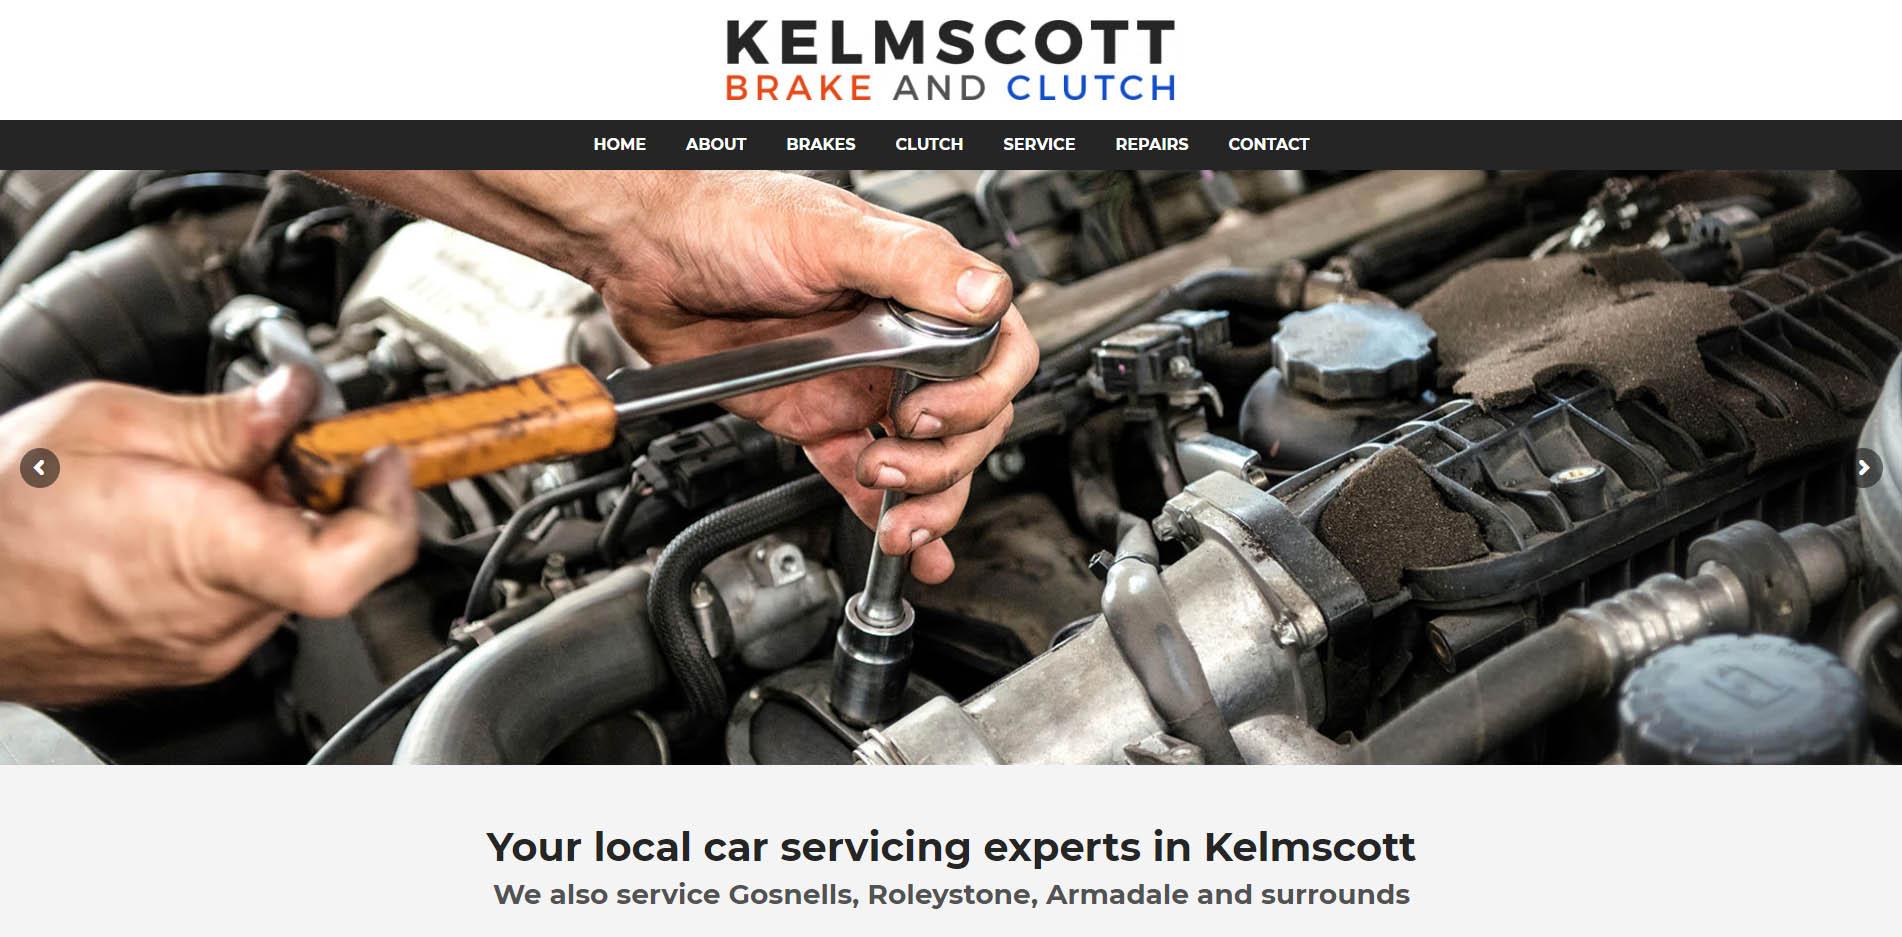 Kelmscott Brake and Clutch